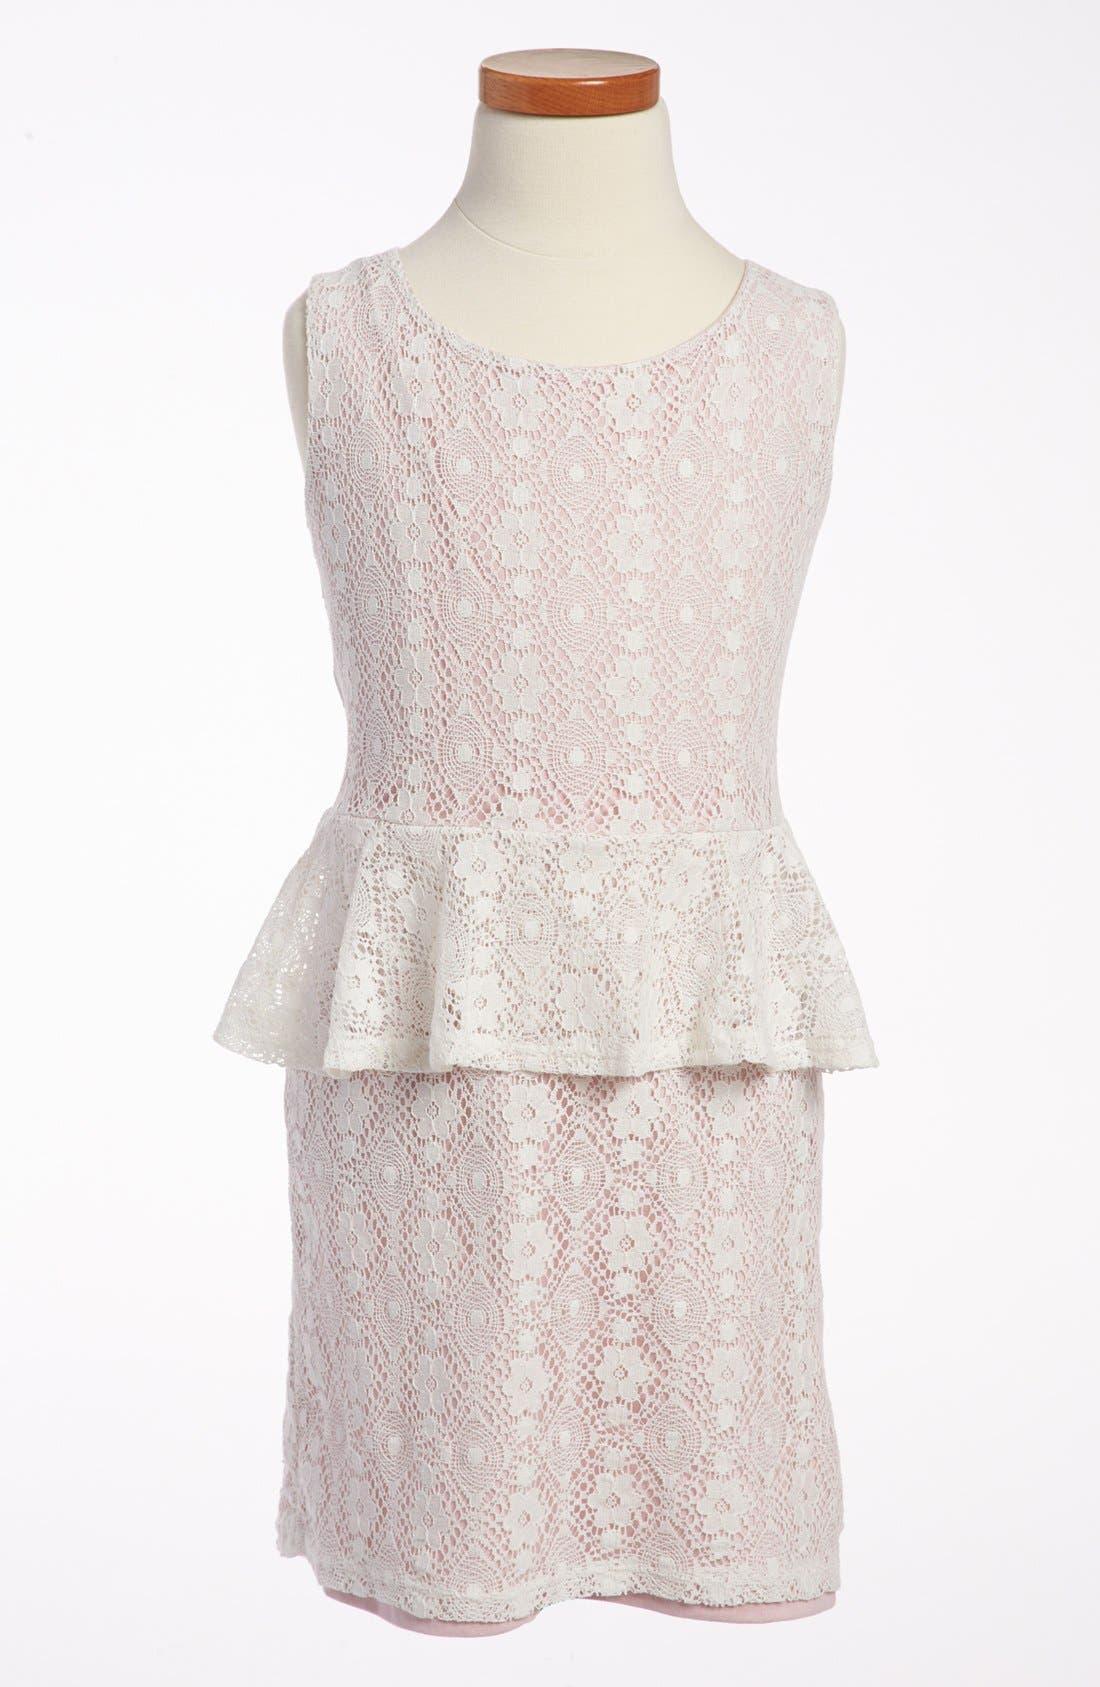 Alternate Image 1 Selected - Mia Chica Peplum Dress (Big Girls)